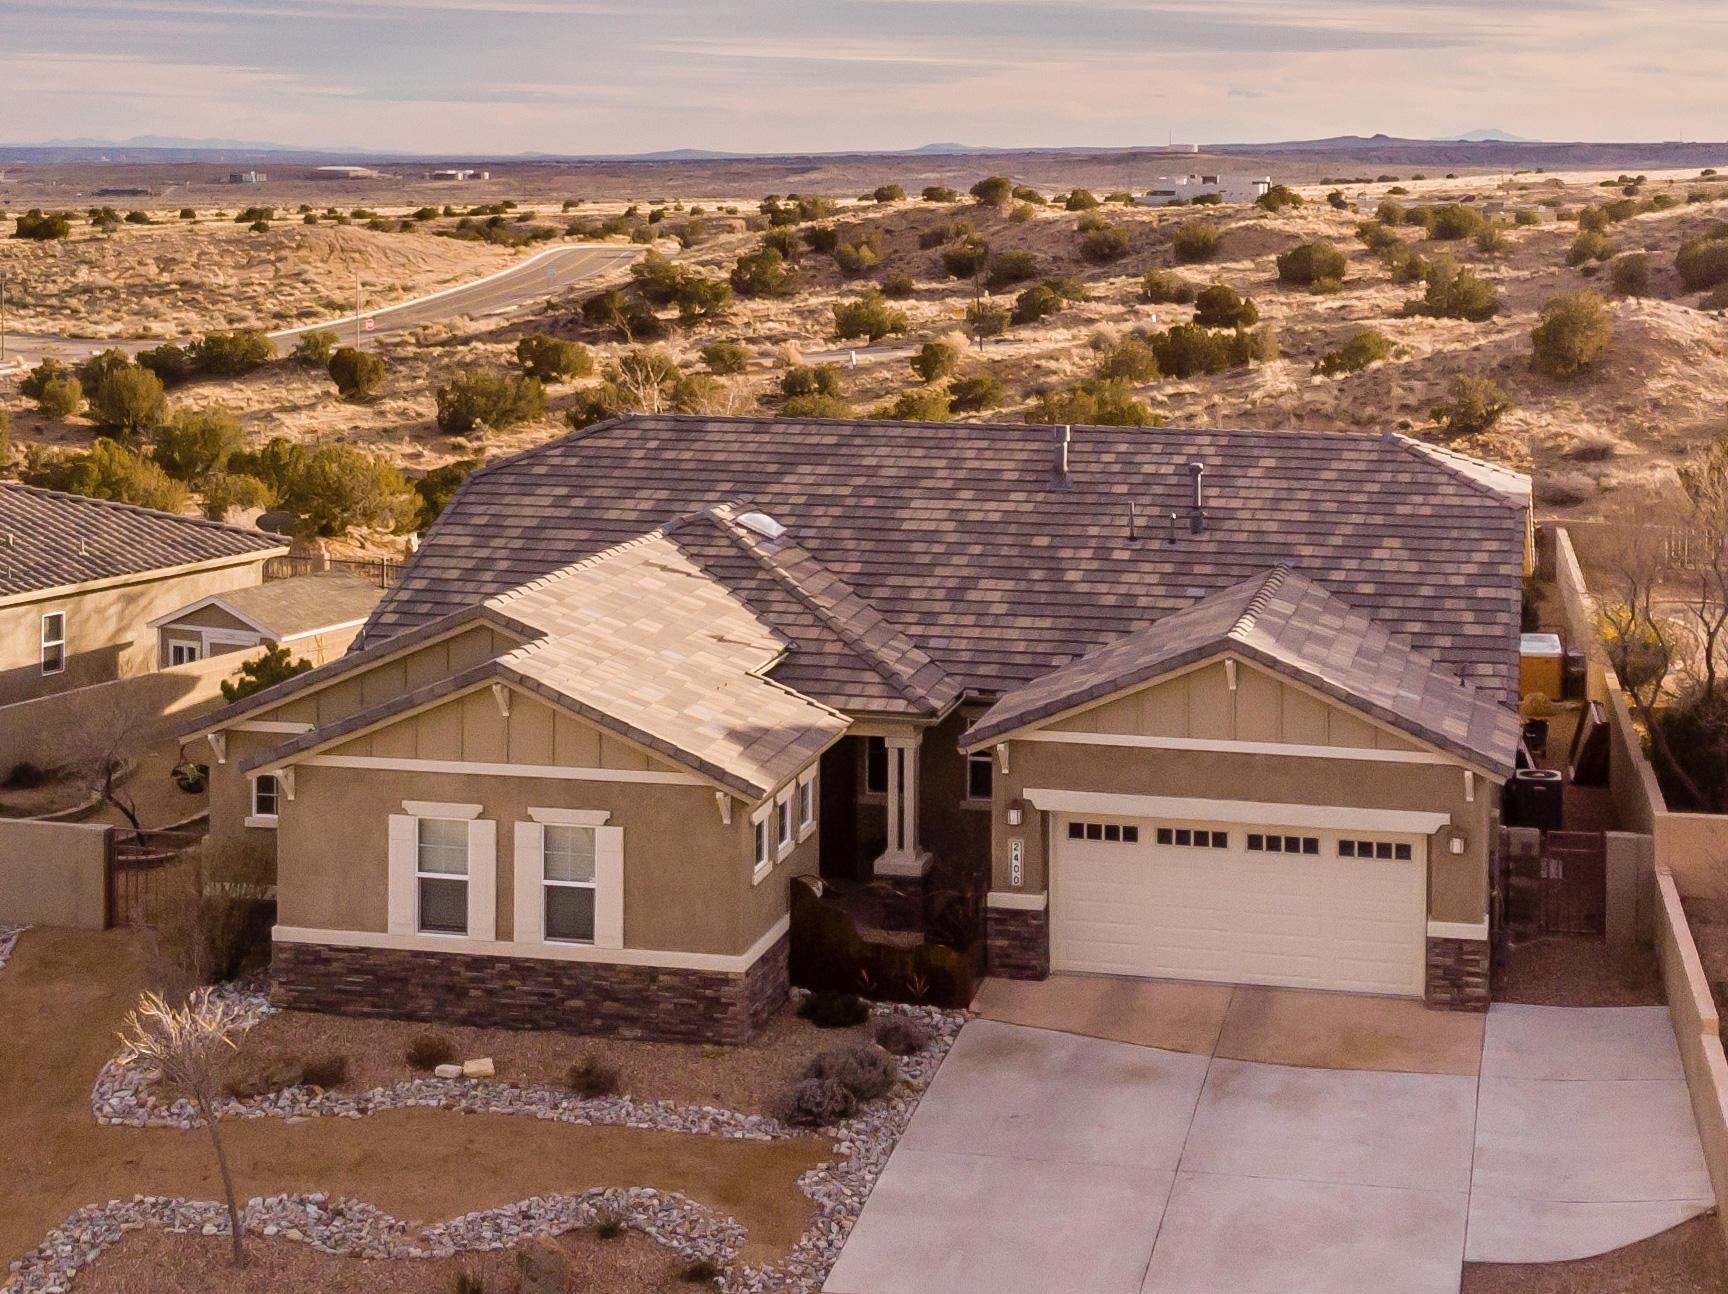 2400 NE Desert View Road, Rio Rancho, New Mexico